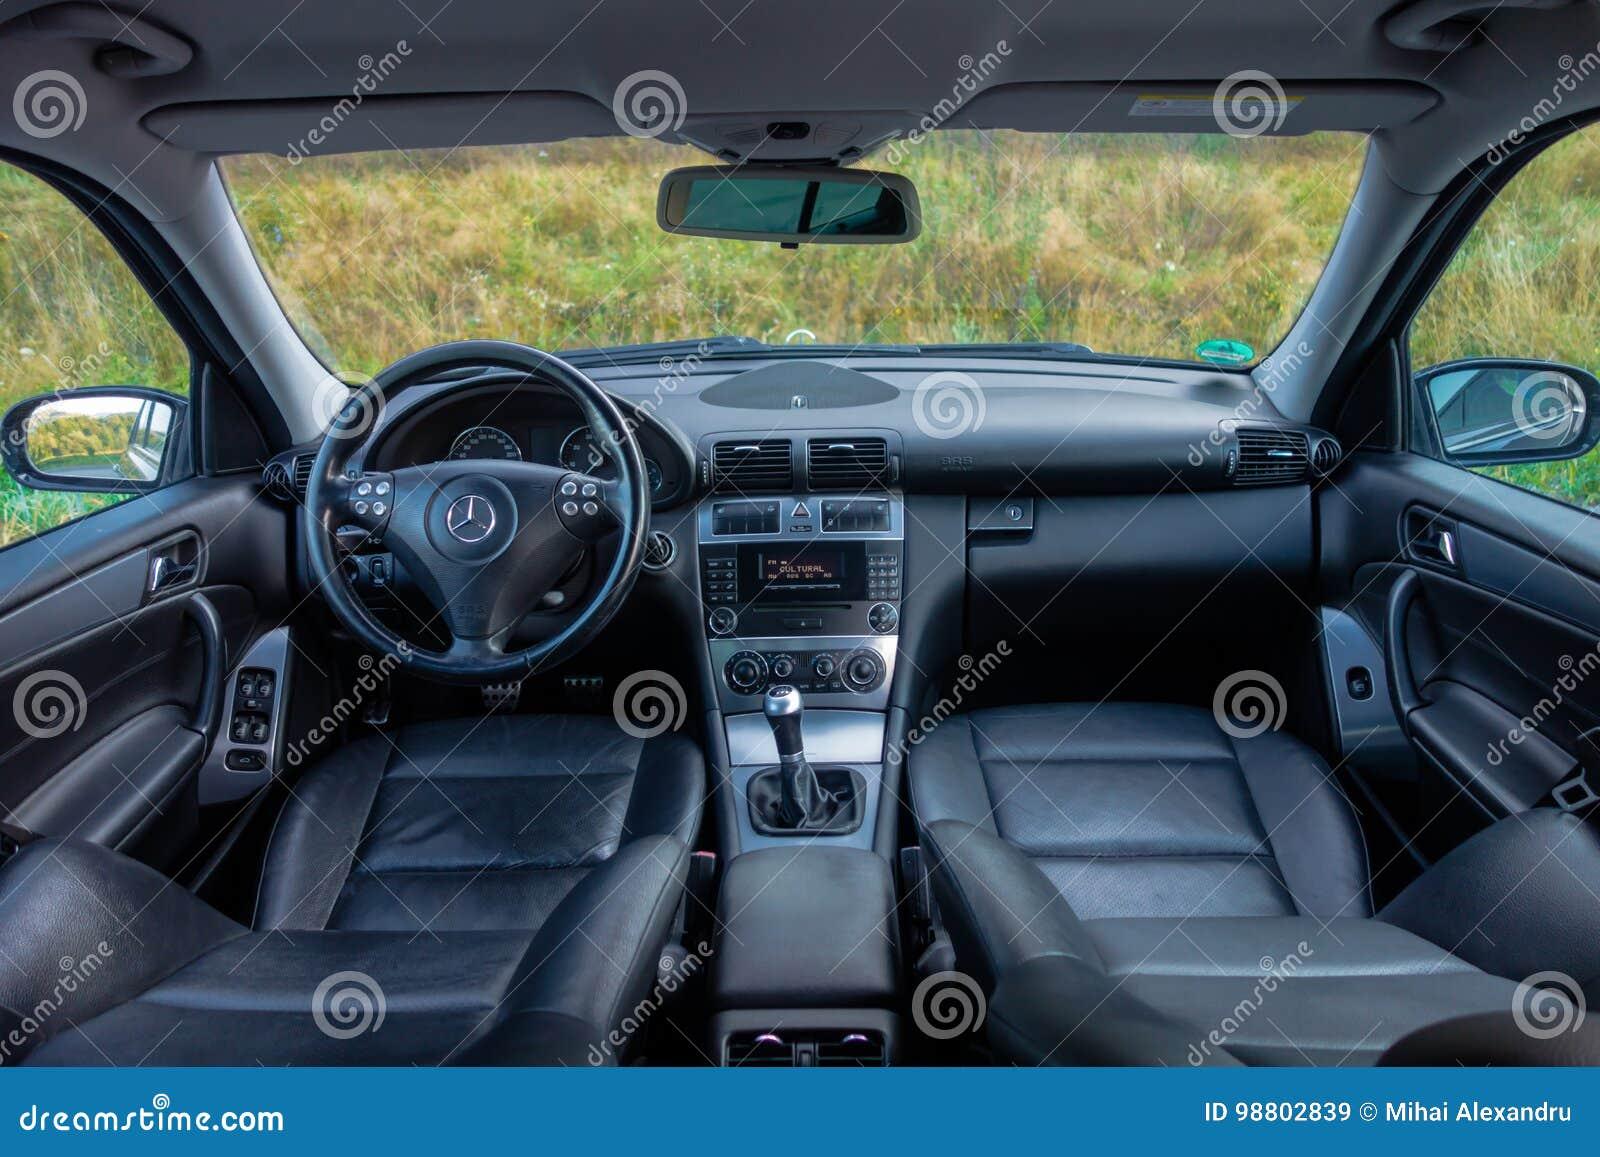 German Luxurious Limousine Interior Sedan Leather Seats Editorial